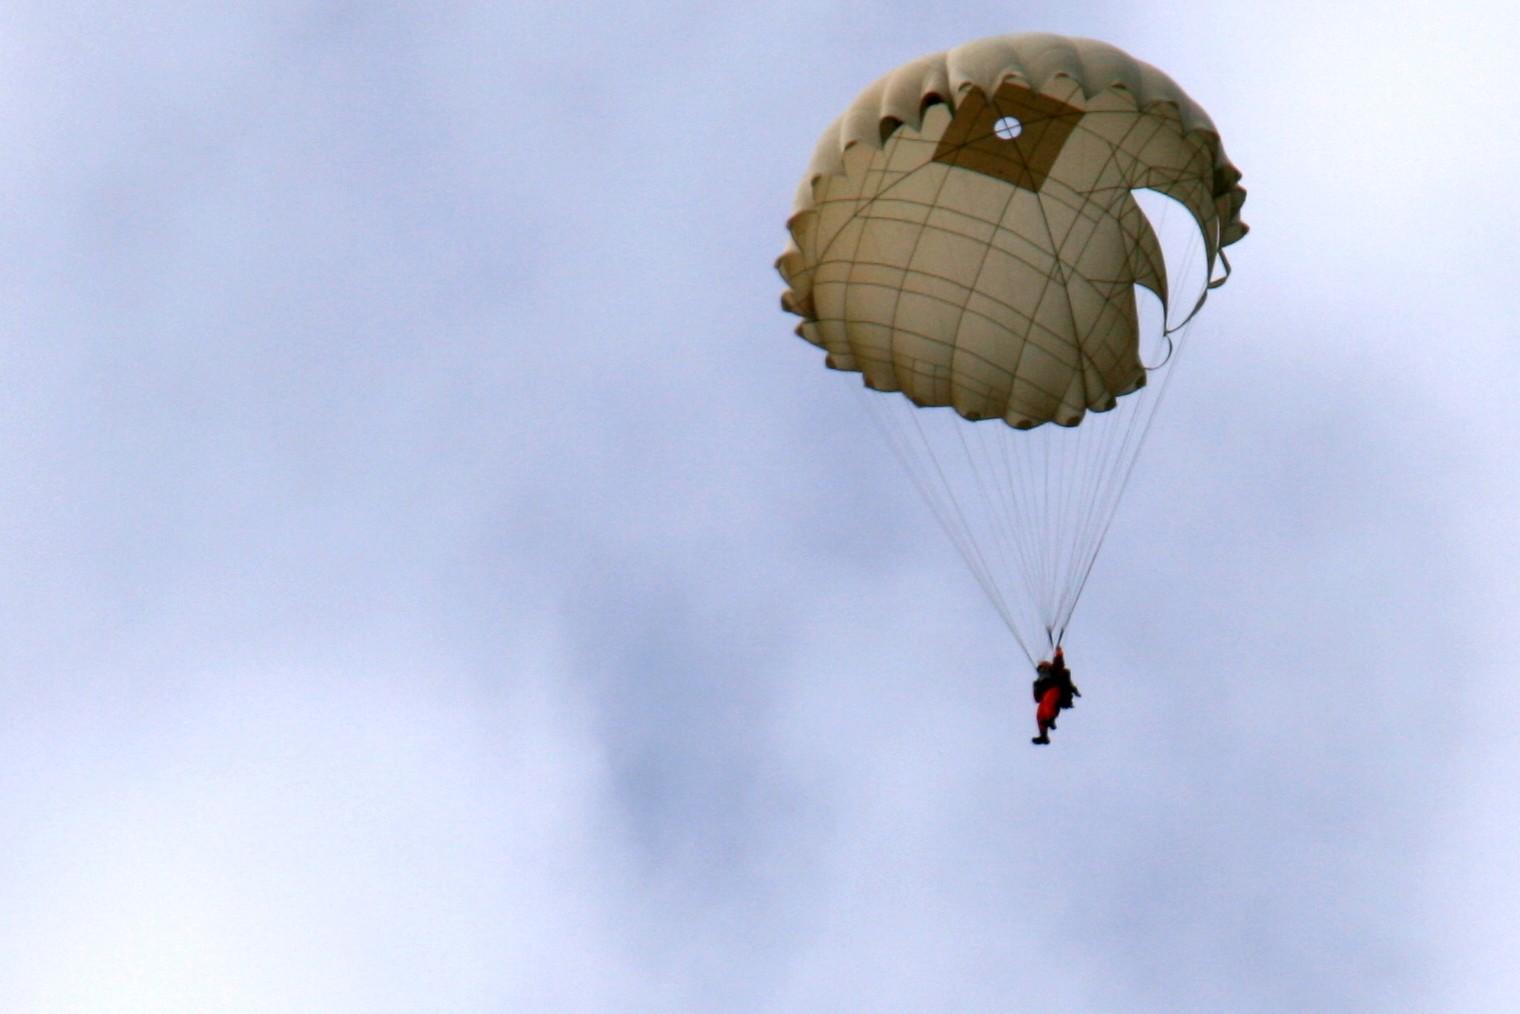 сбрасывали ли саушку на парашюте корзину Главная КАТАЛОГ